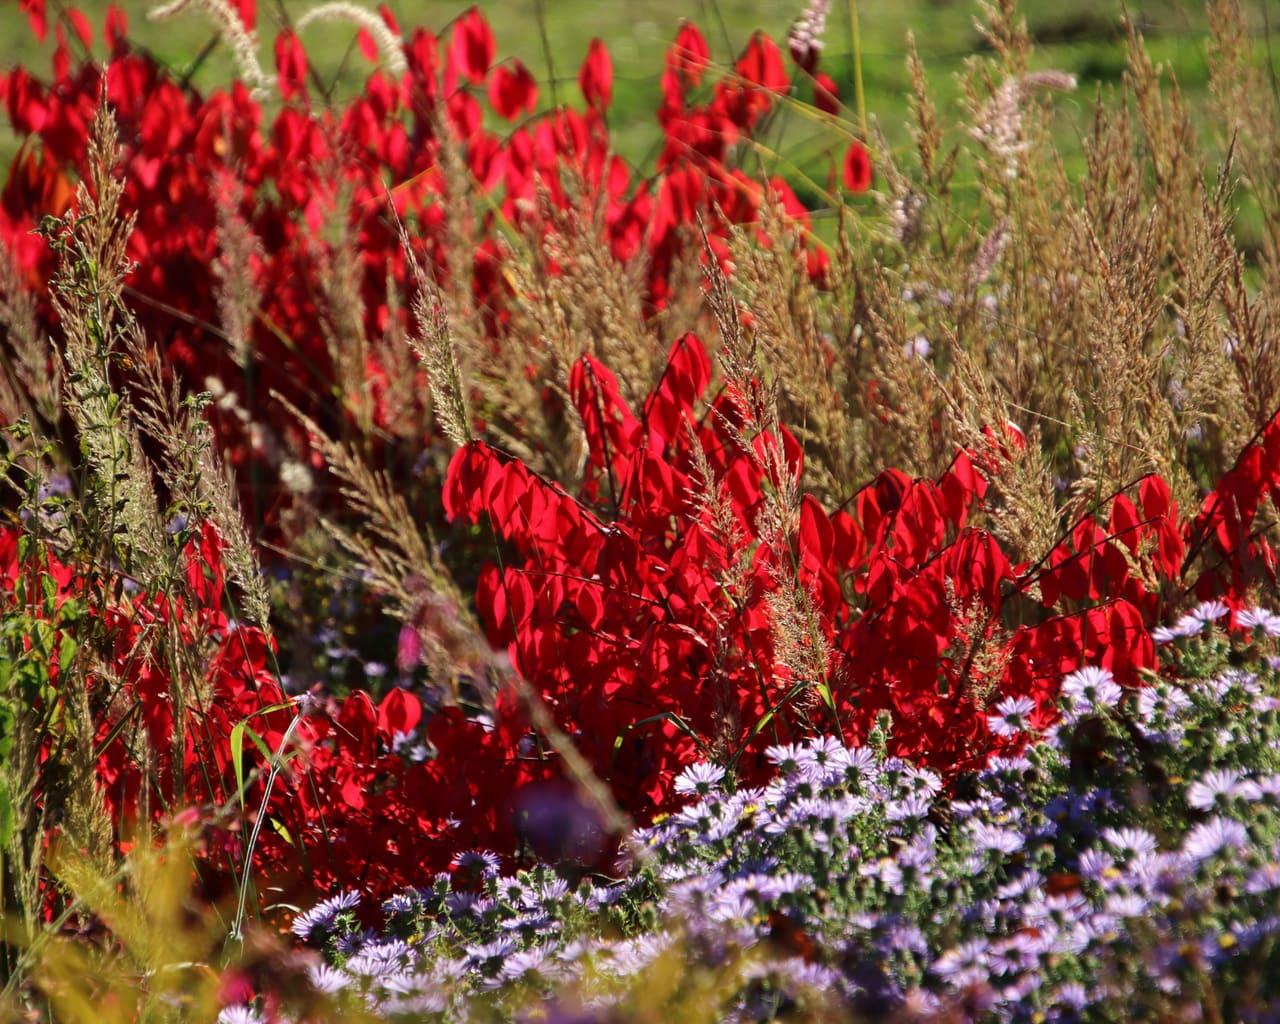 Herbstfärbung mit Pfaffenhütchen - Euonymus alatus Compactus, Garten Petra Pelz in Sehnde